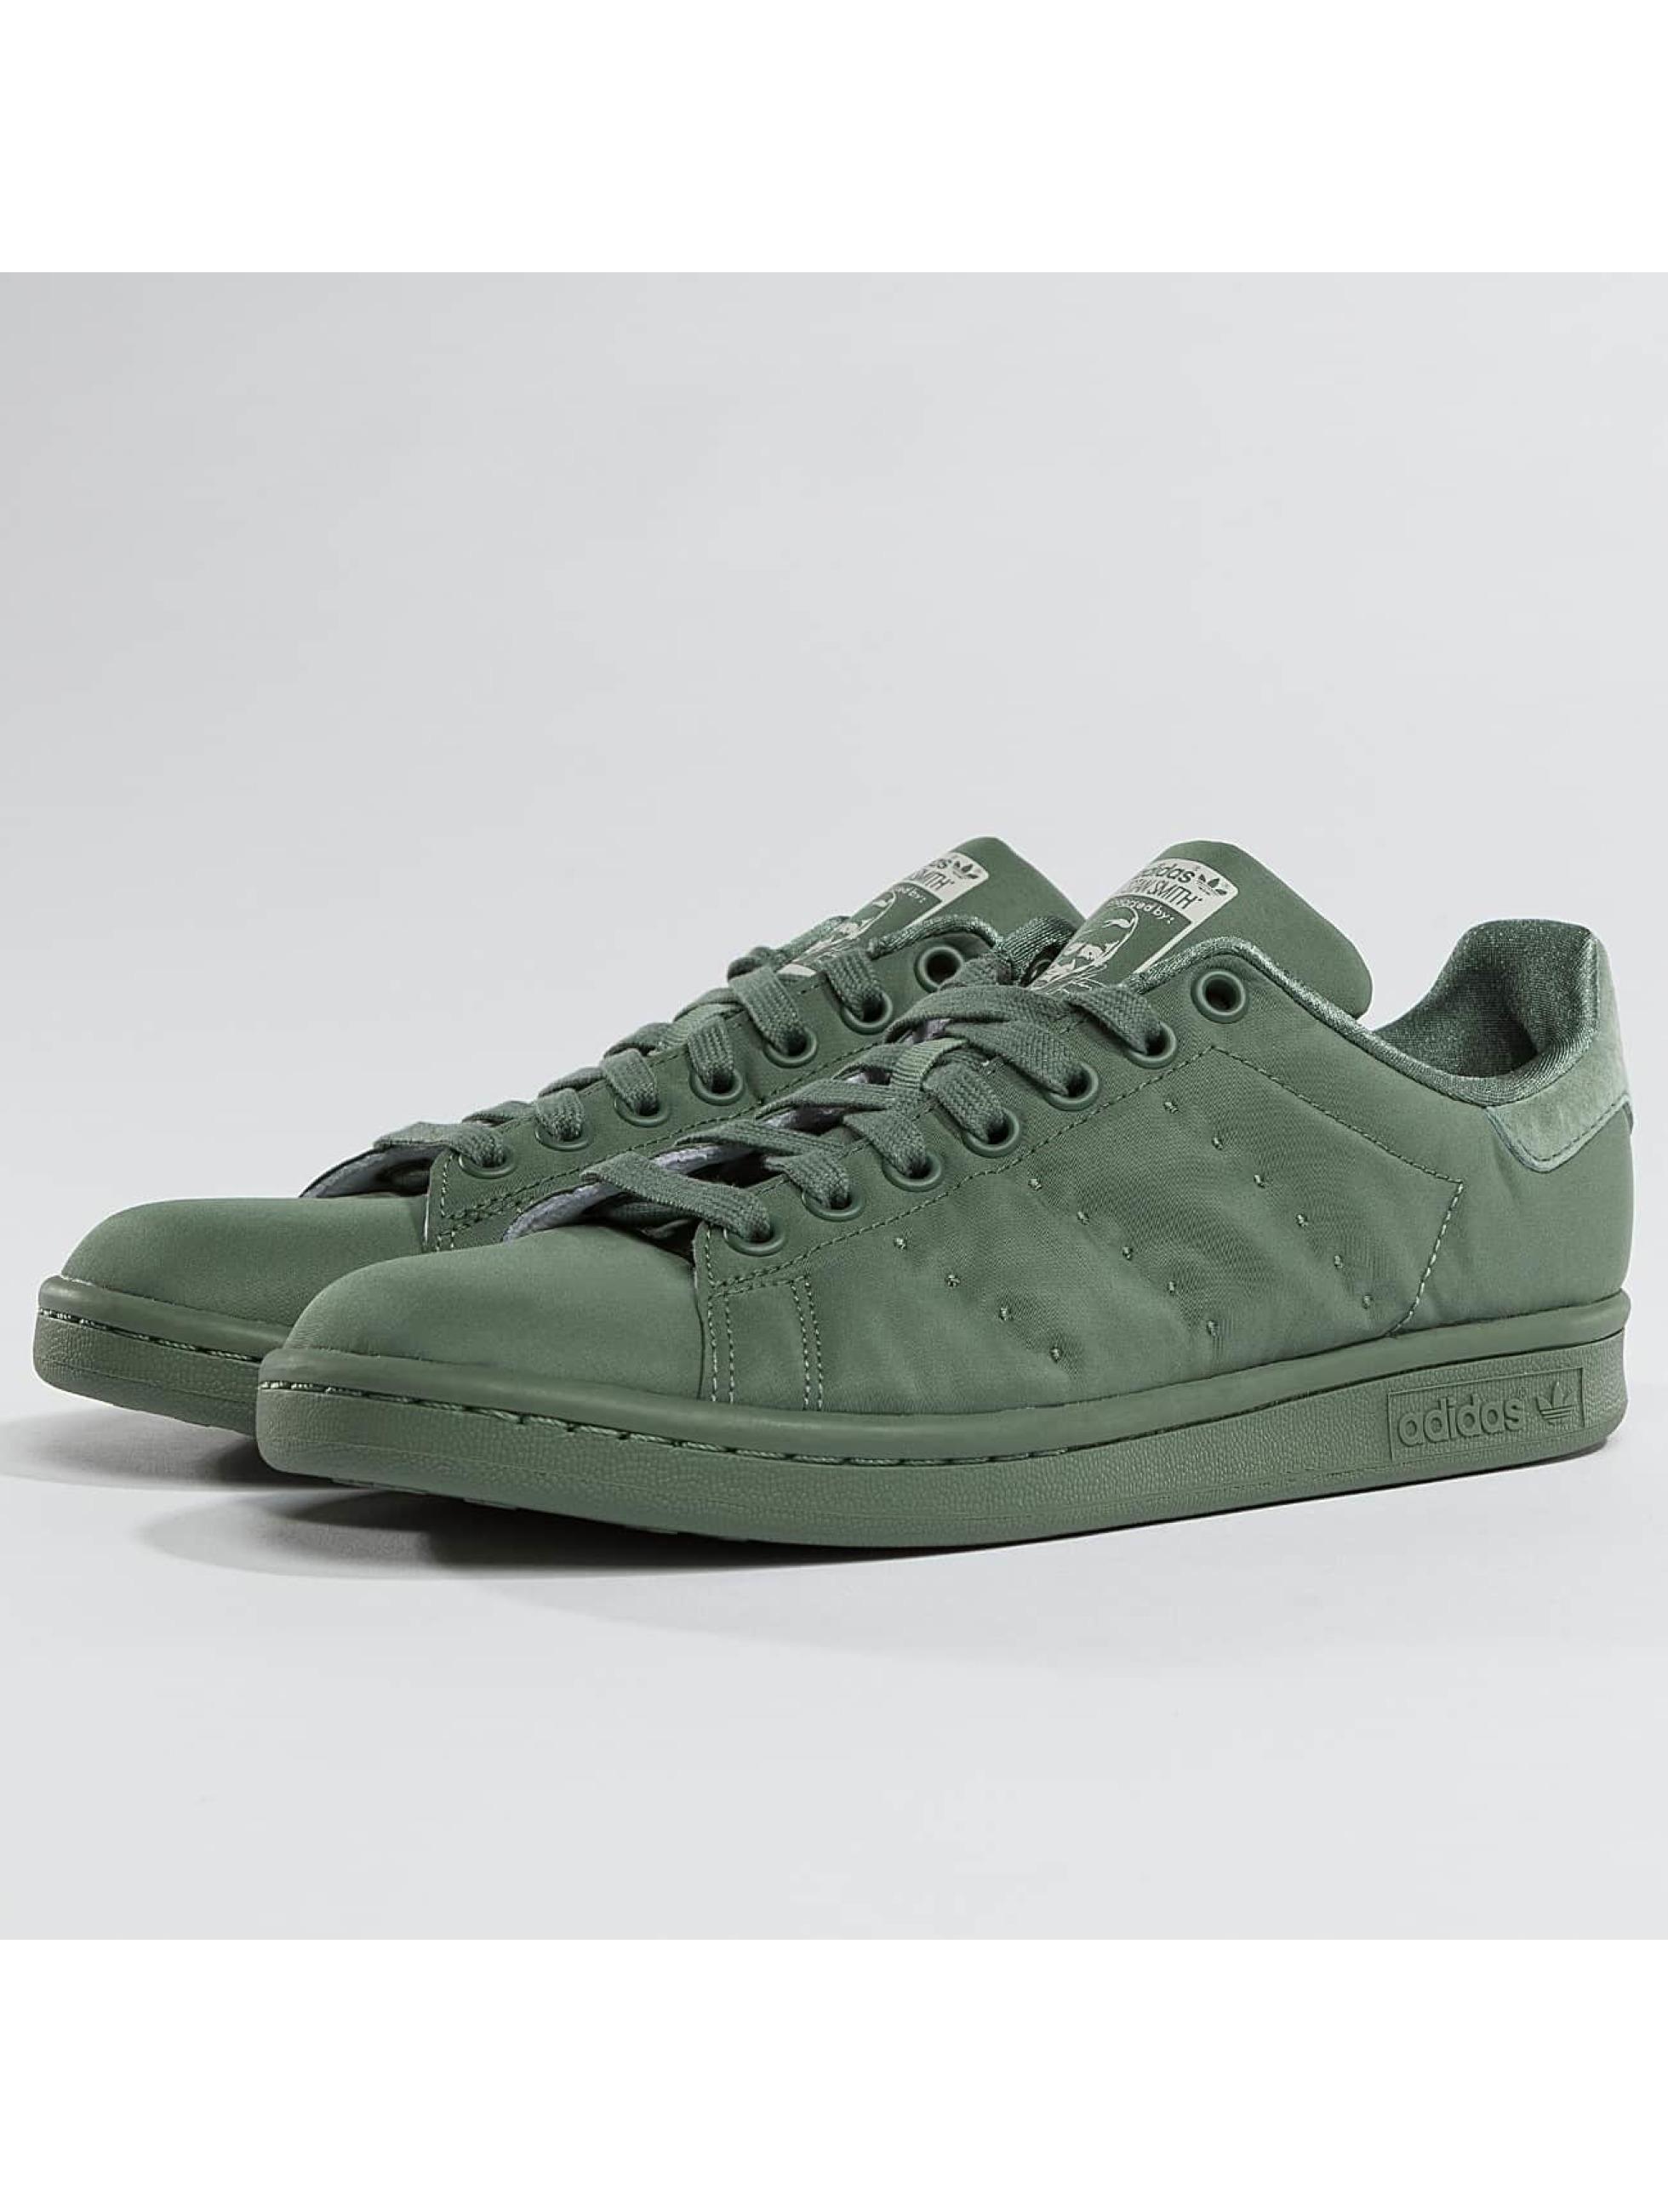 adidas Frauen Sneaker Stan Smith in grün